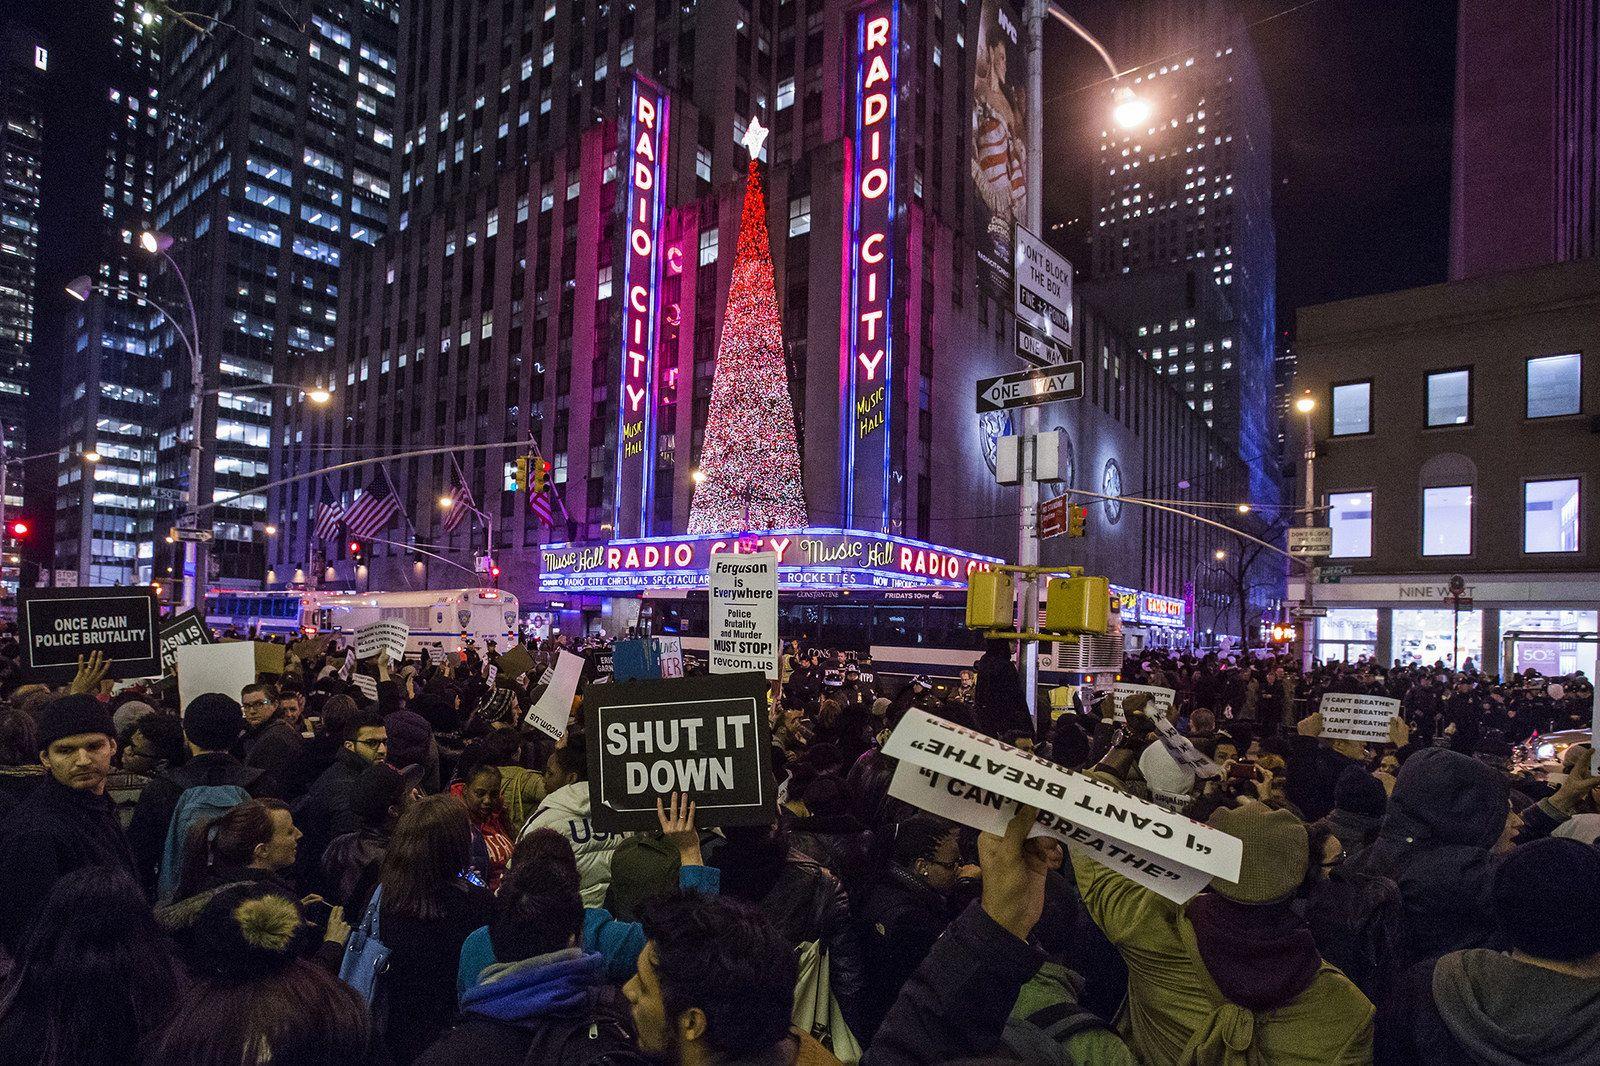 39 Dramatic Photos Of The Eric Garner Protests In New York City Radio City Music Hall Radio City Eric Garner